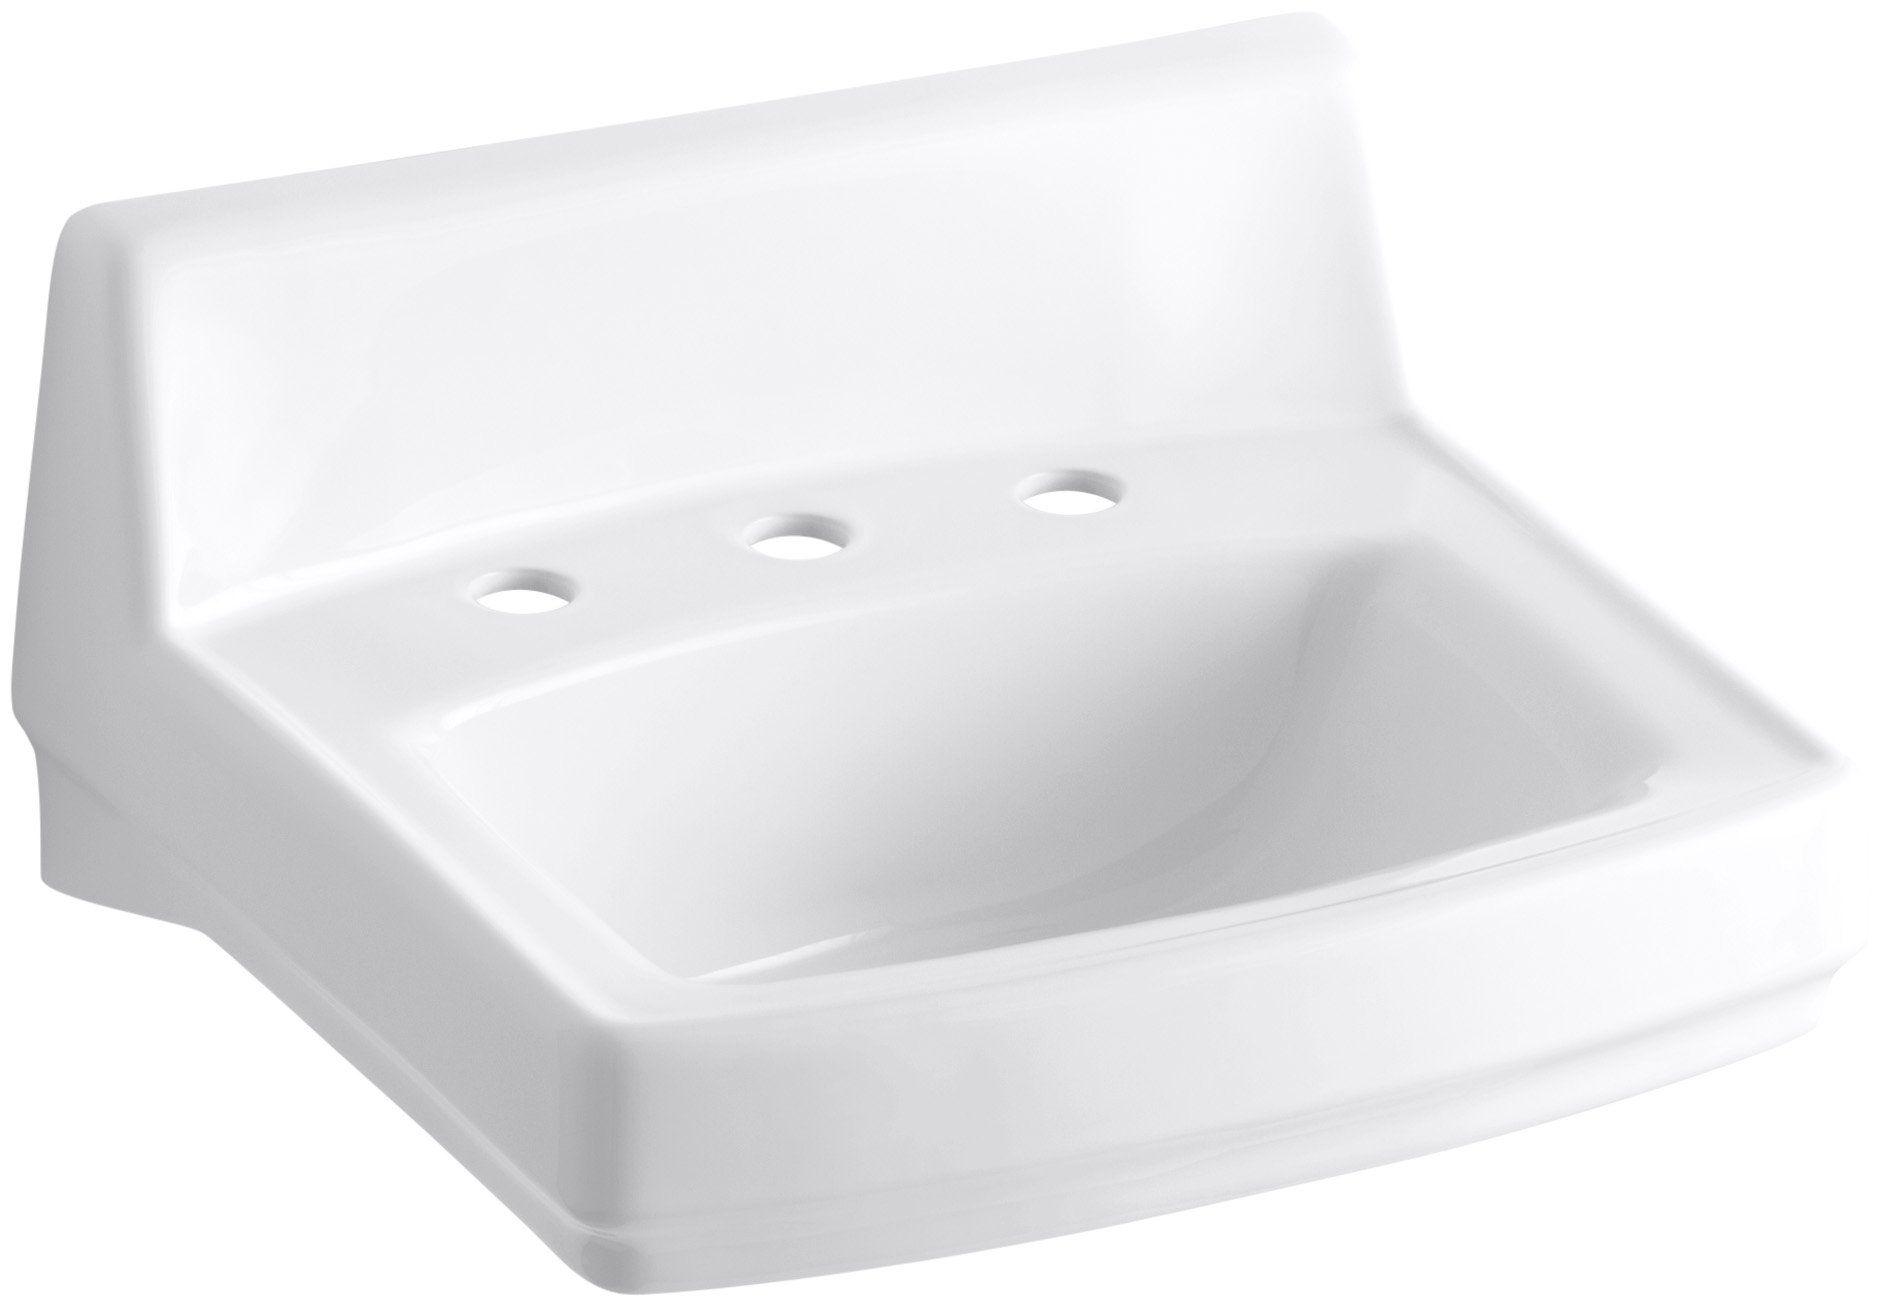 lowest price ever popular online shop KOHLER K-2030-0 Greenwich Wall-Mount Bathroom Sink, White ...